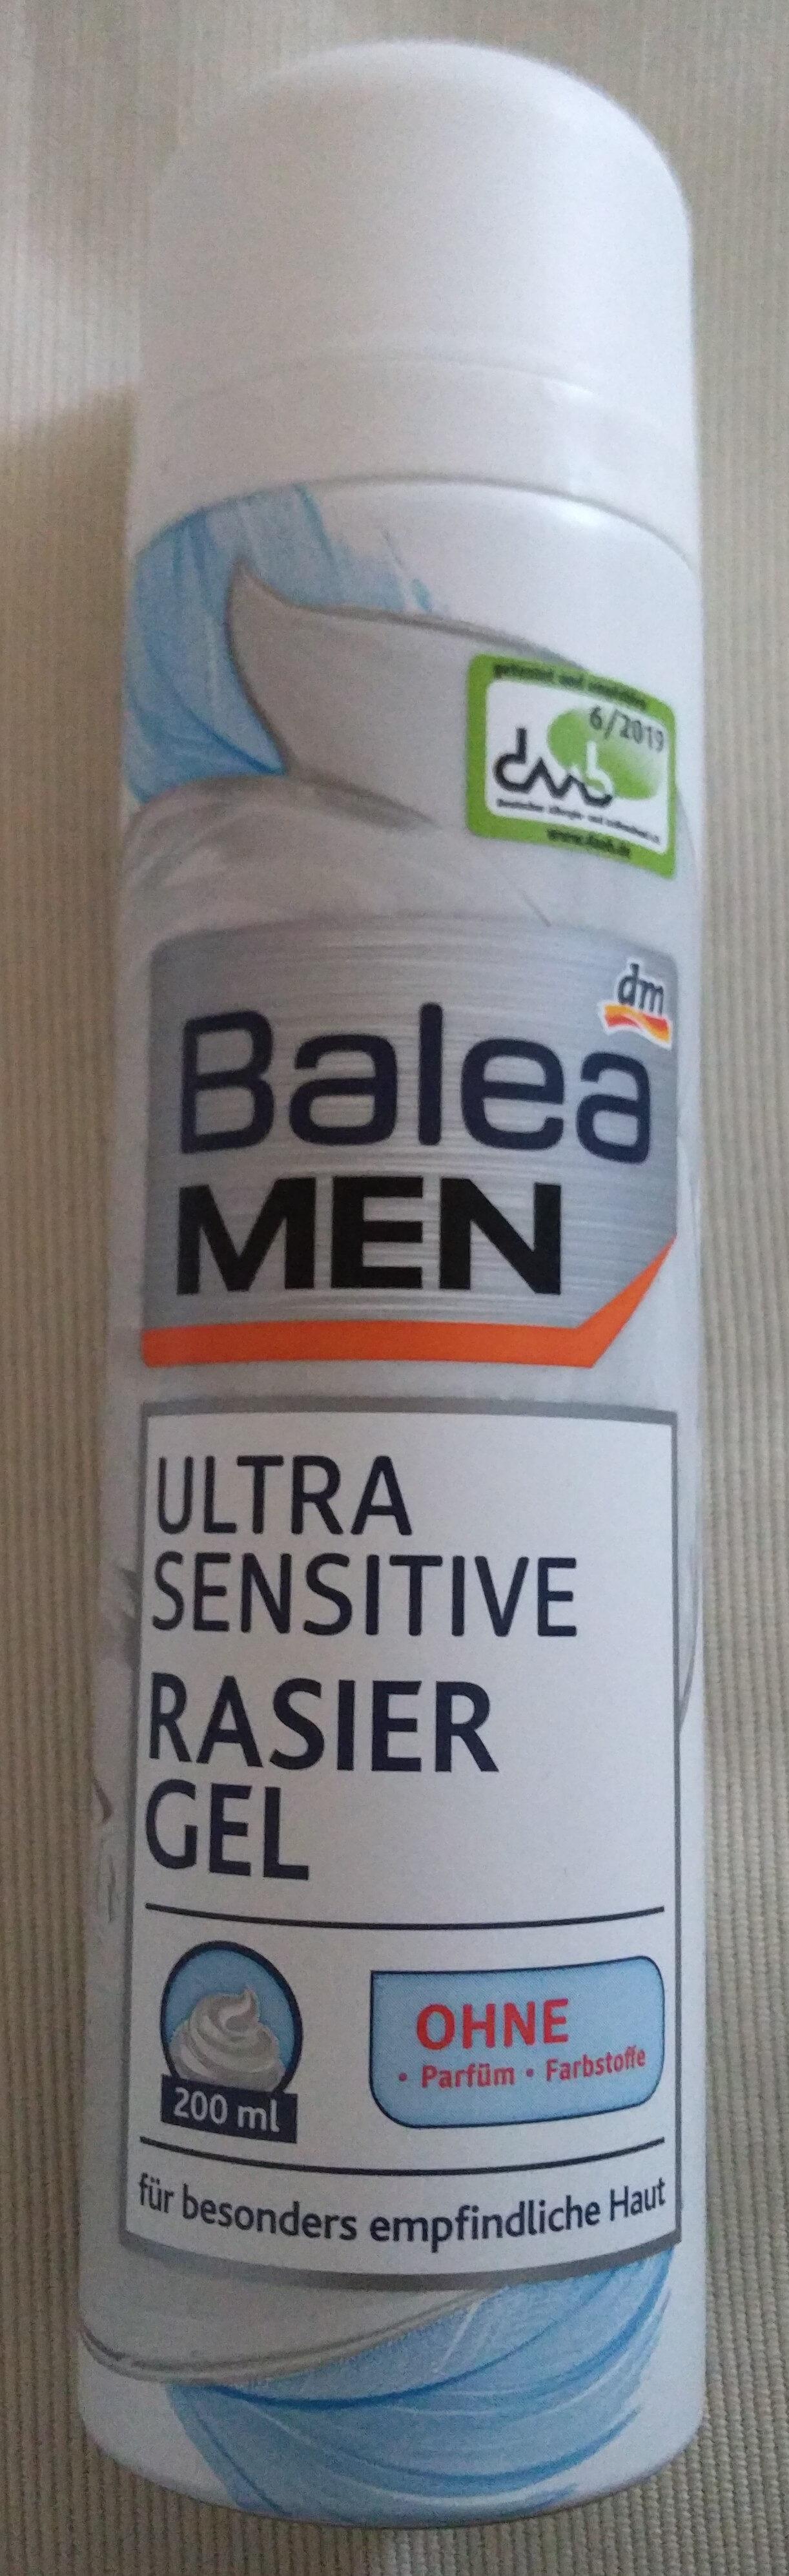 Ultra Sensitive Rasiergel - Produit - de